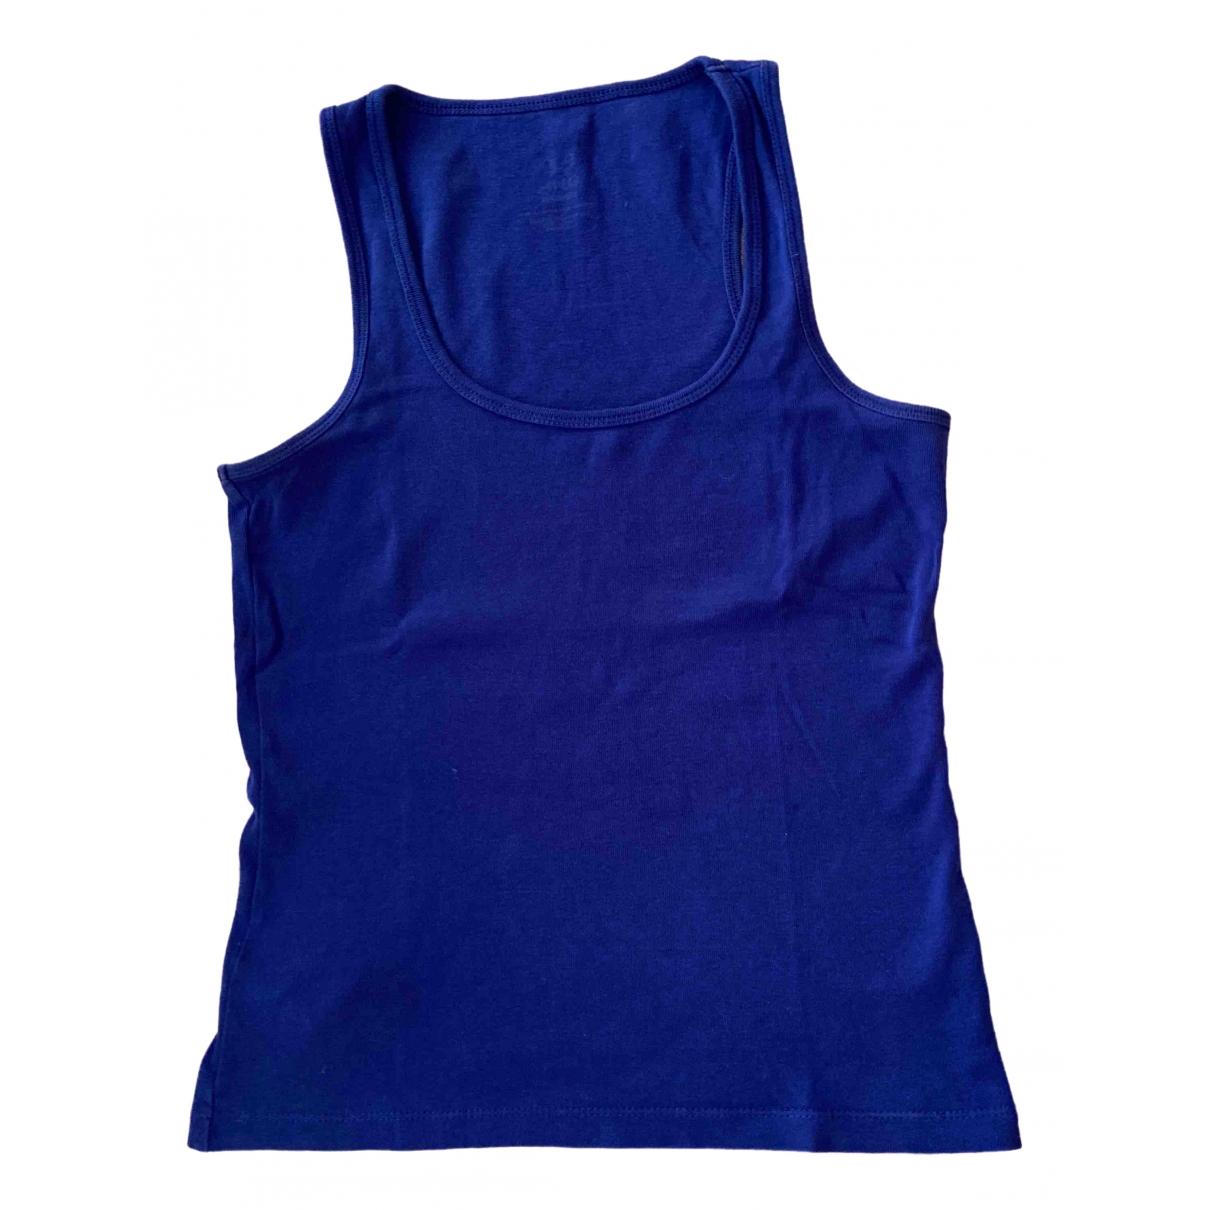 Mango \N Blue Cotton  top for Women S International